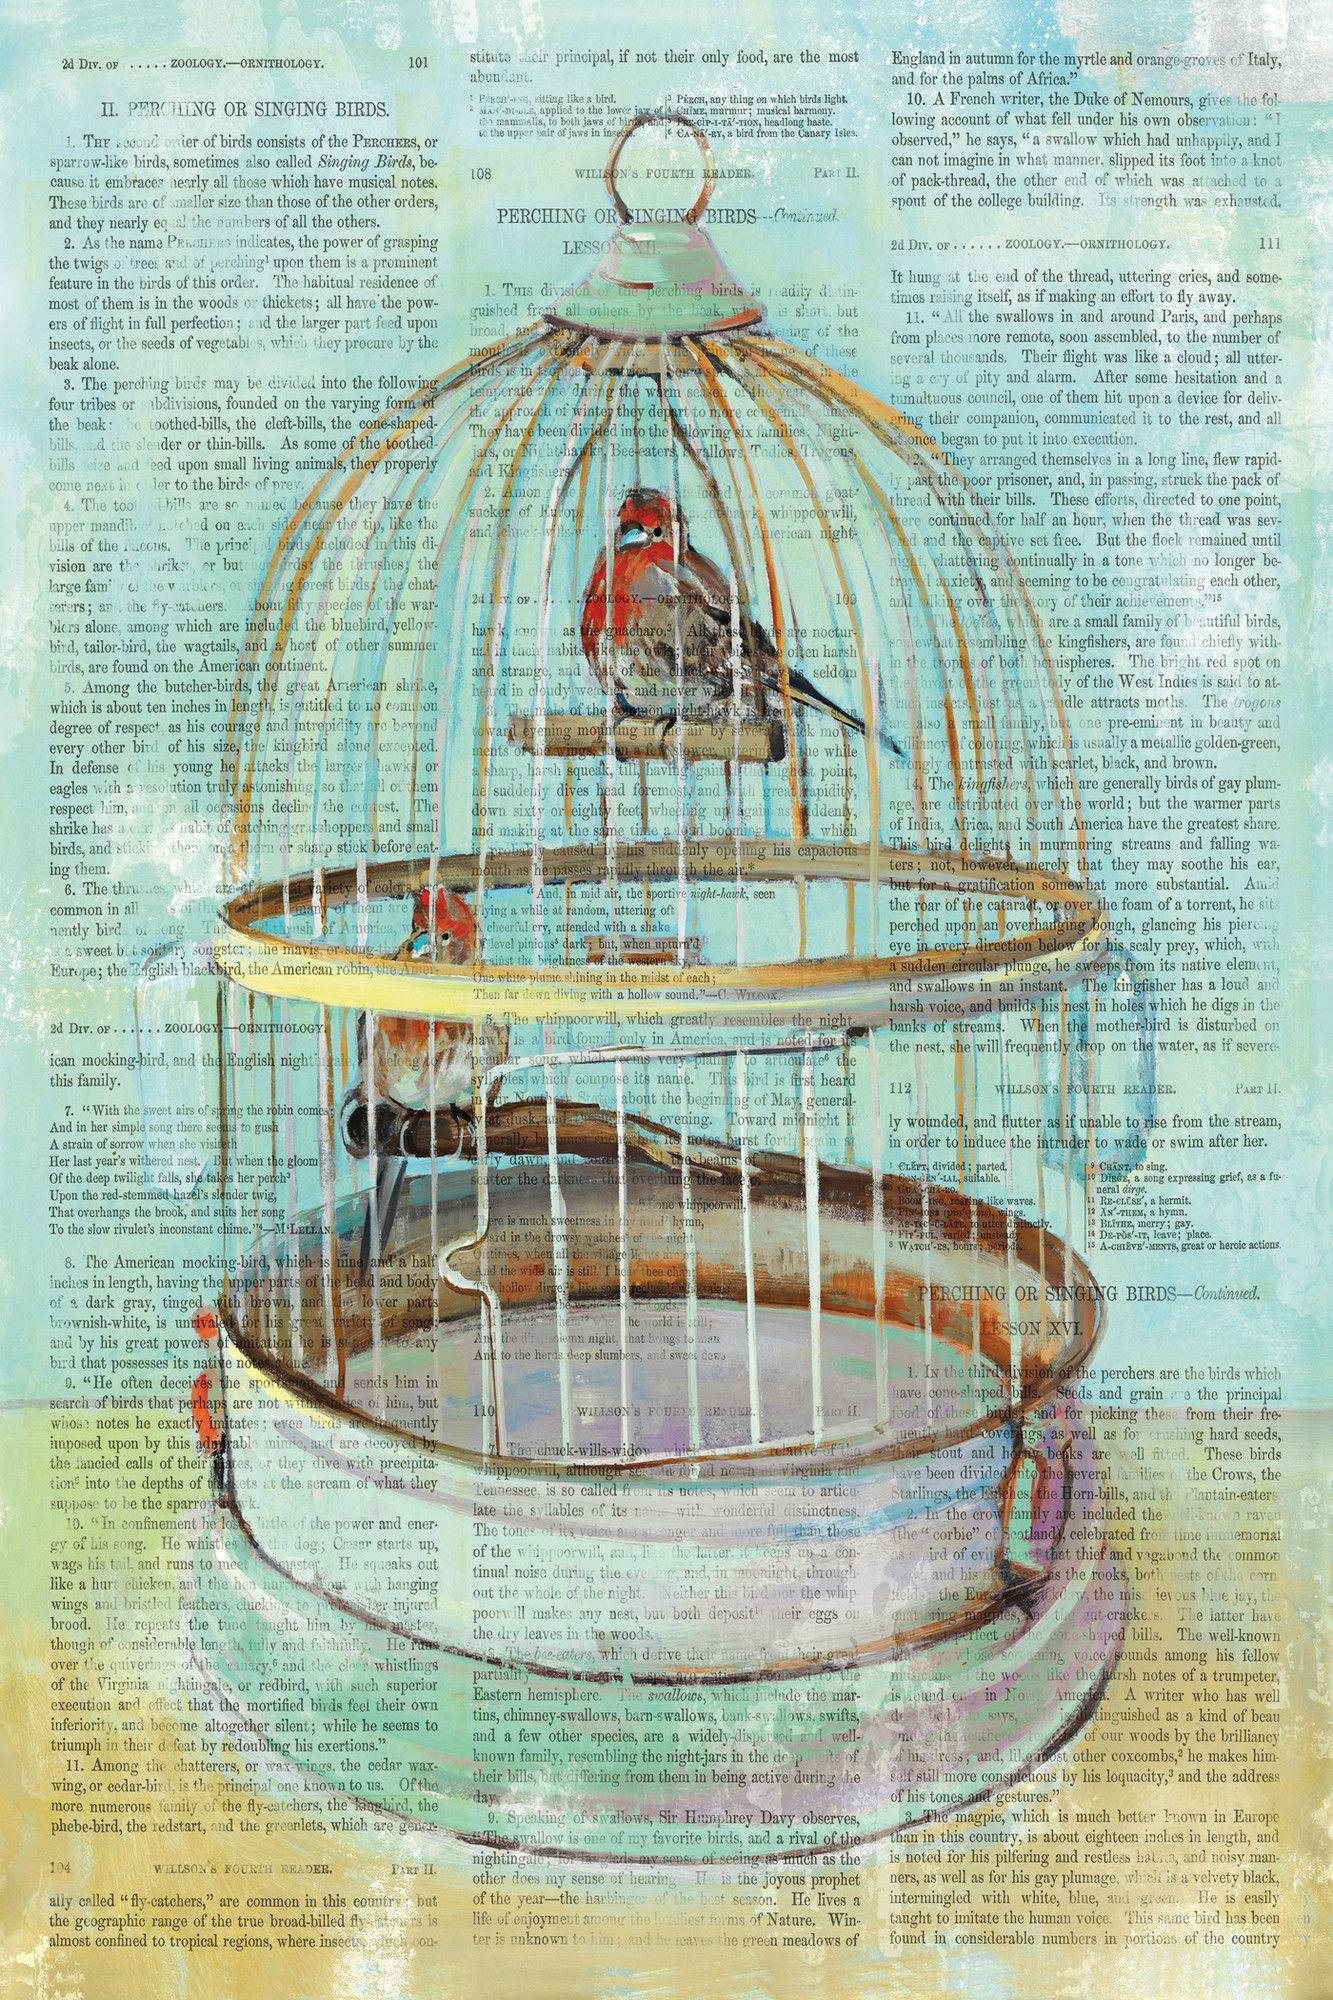 Portfolio Canvas Birdcage Dictionary I Version 2 By Elinorluna Graphic Art On Wrapped Canvas Stretched Canvas Wall Art Canvas Decor Canvas Art Prints